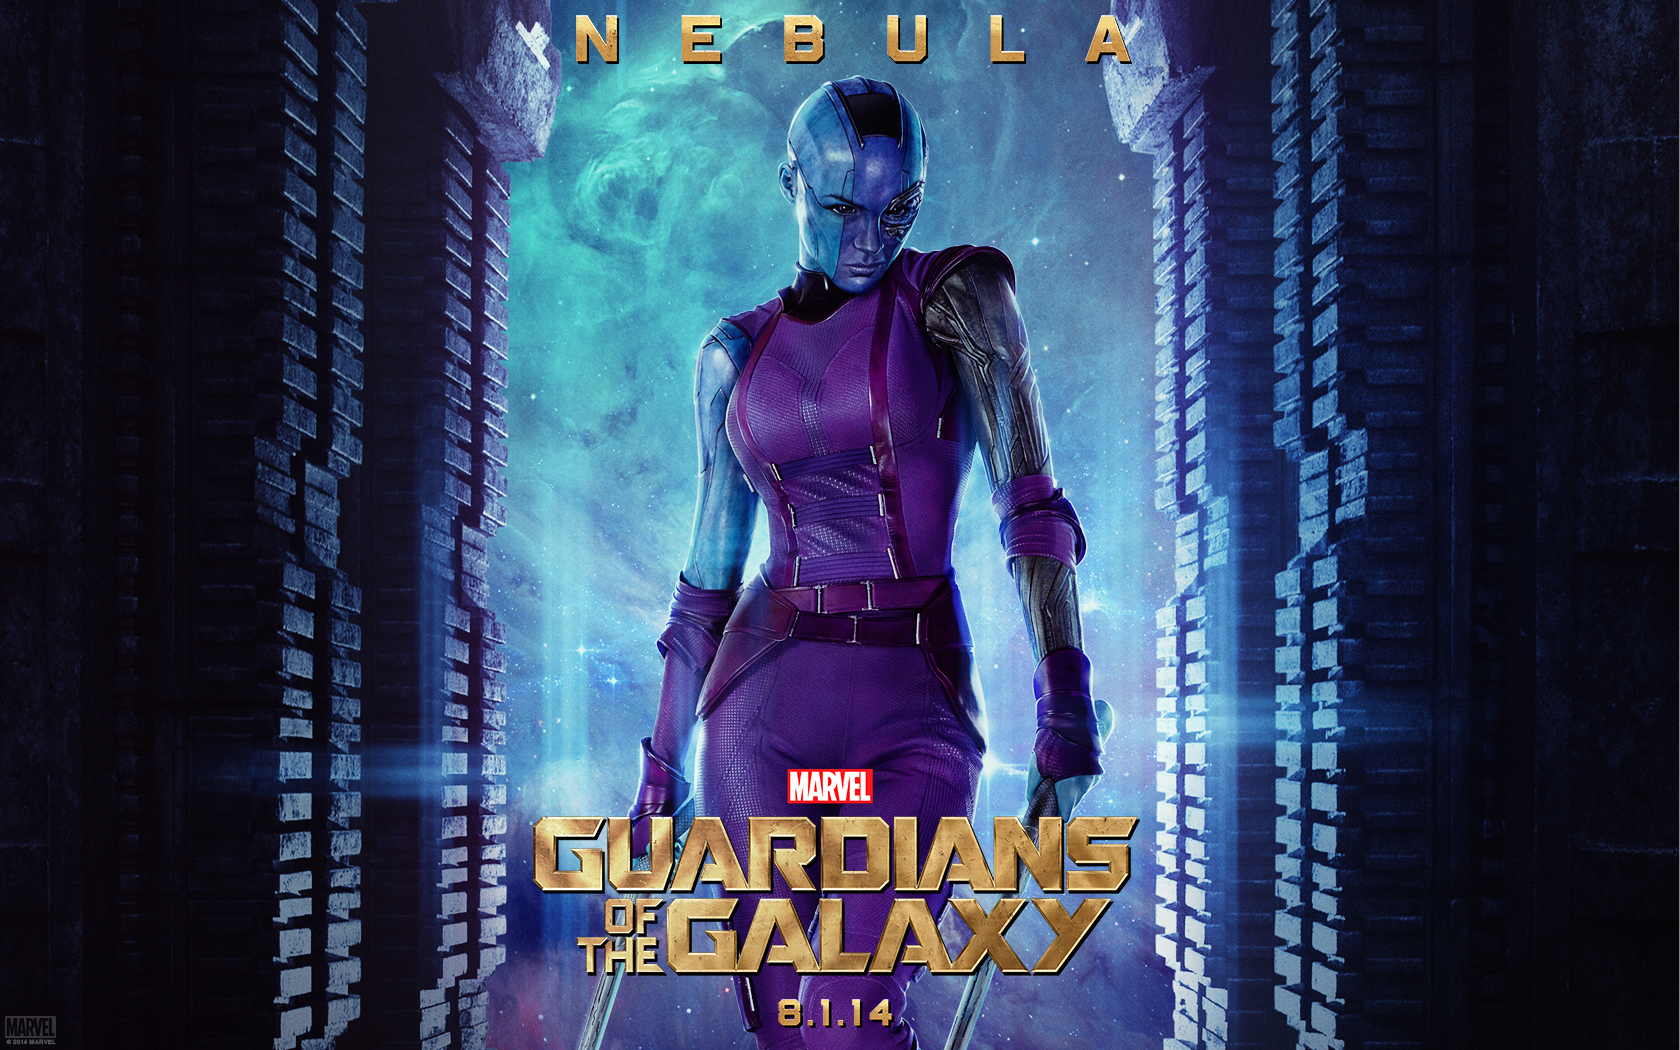 nebula marvel   Ecosia 1680x1050